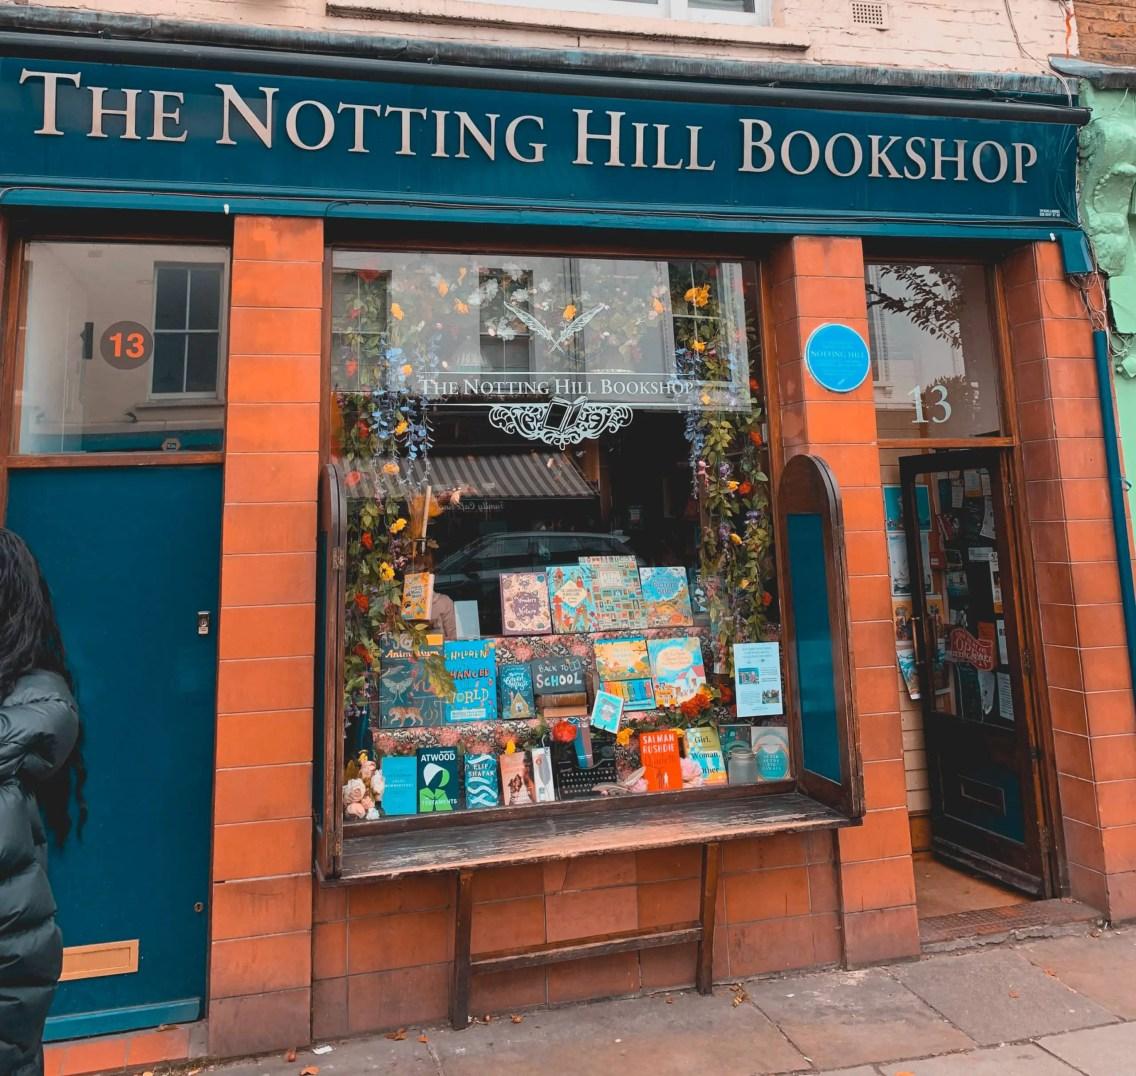 The Notting Hill Bookshop